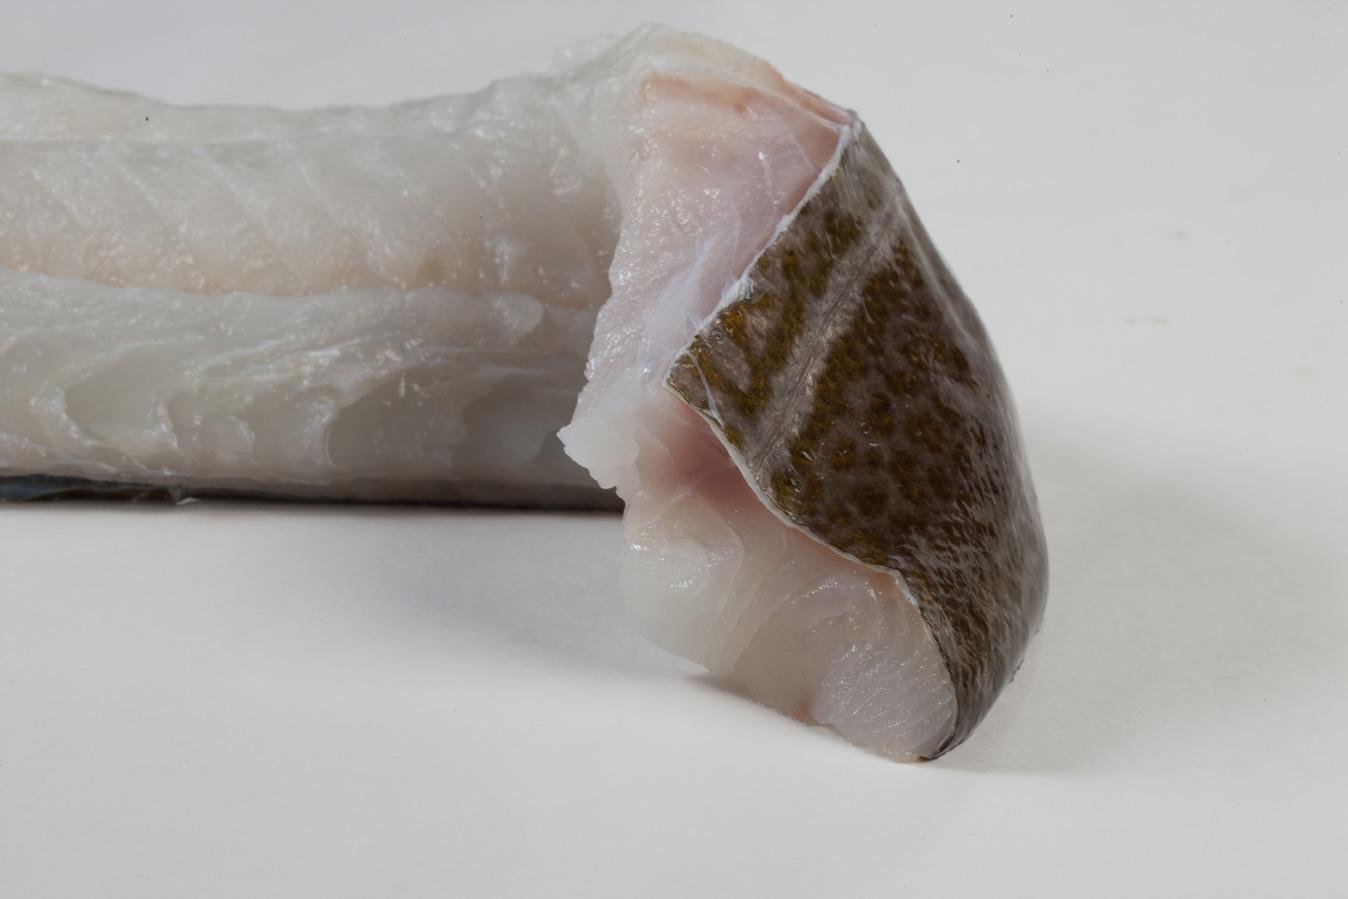 Groothandel-vis-FishXL-vis-kabeljauwfilet_WL_9208